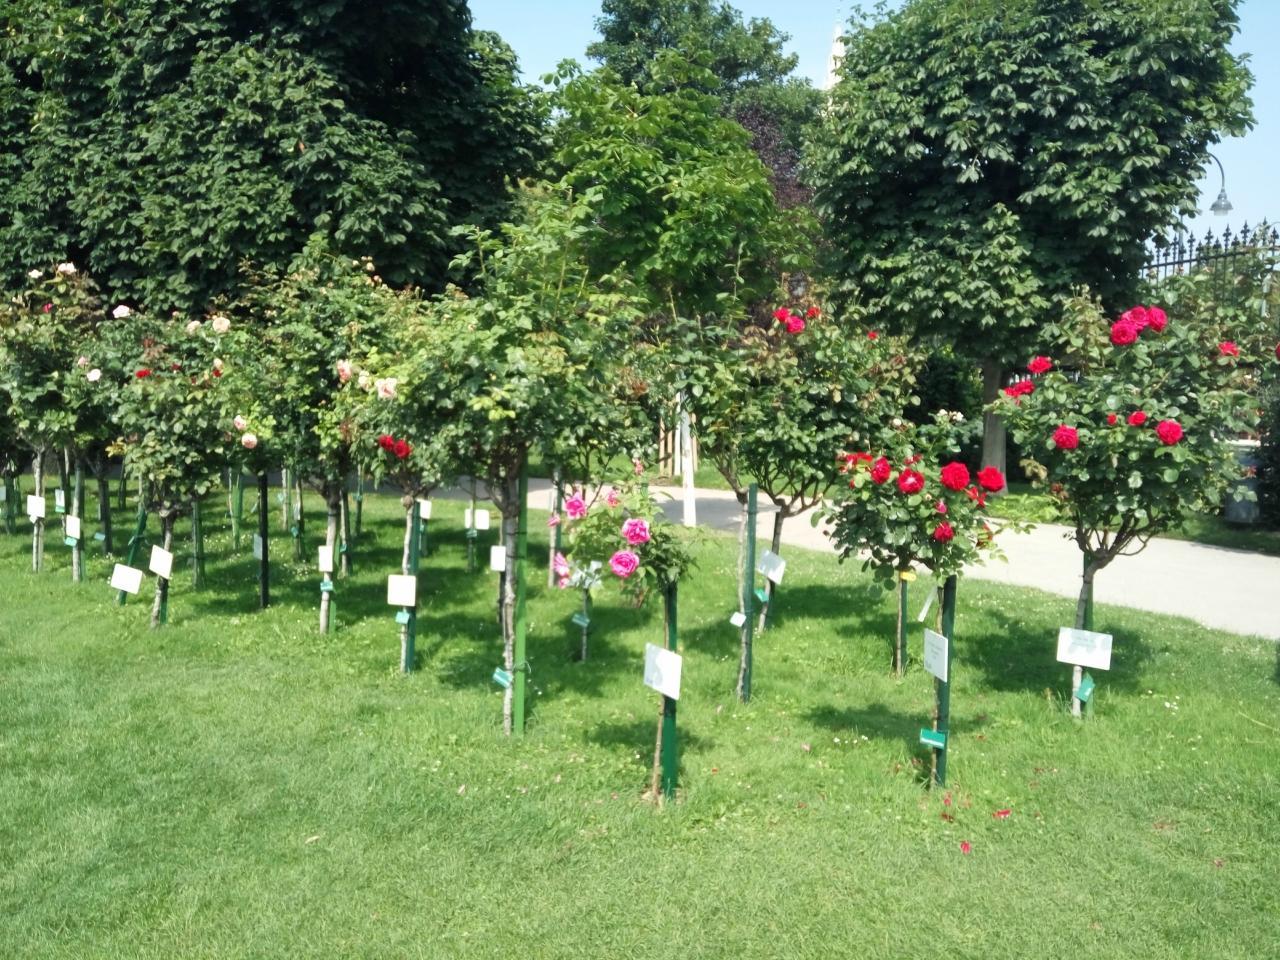 Maroosya Народный сад